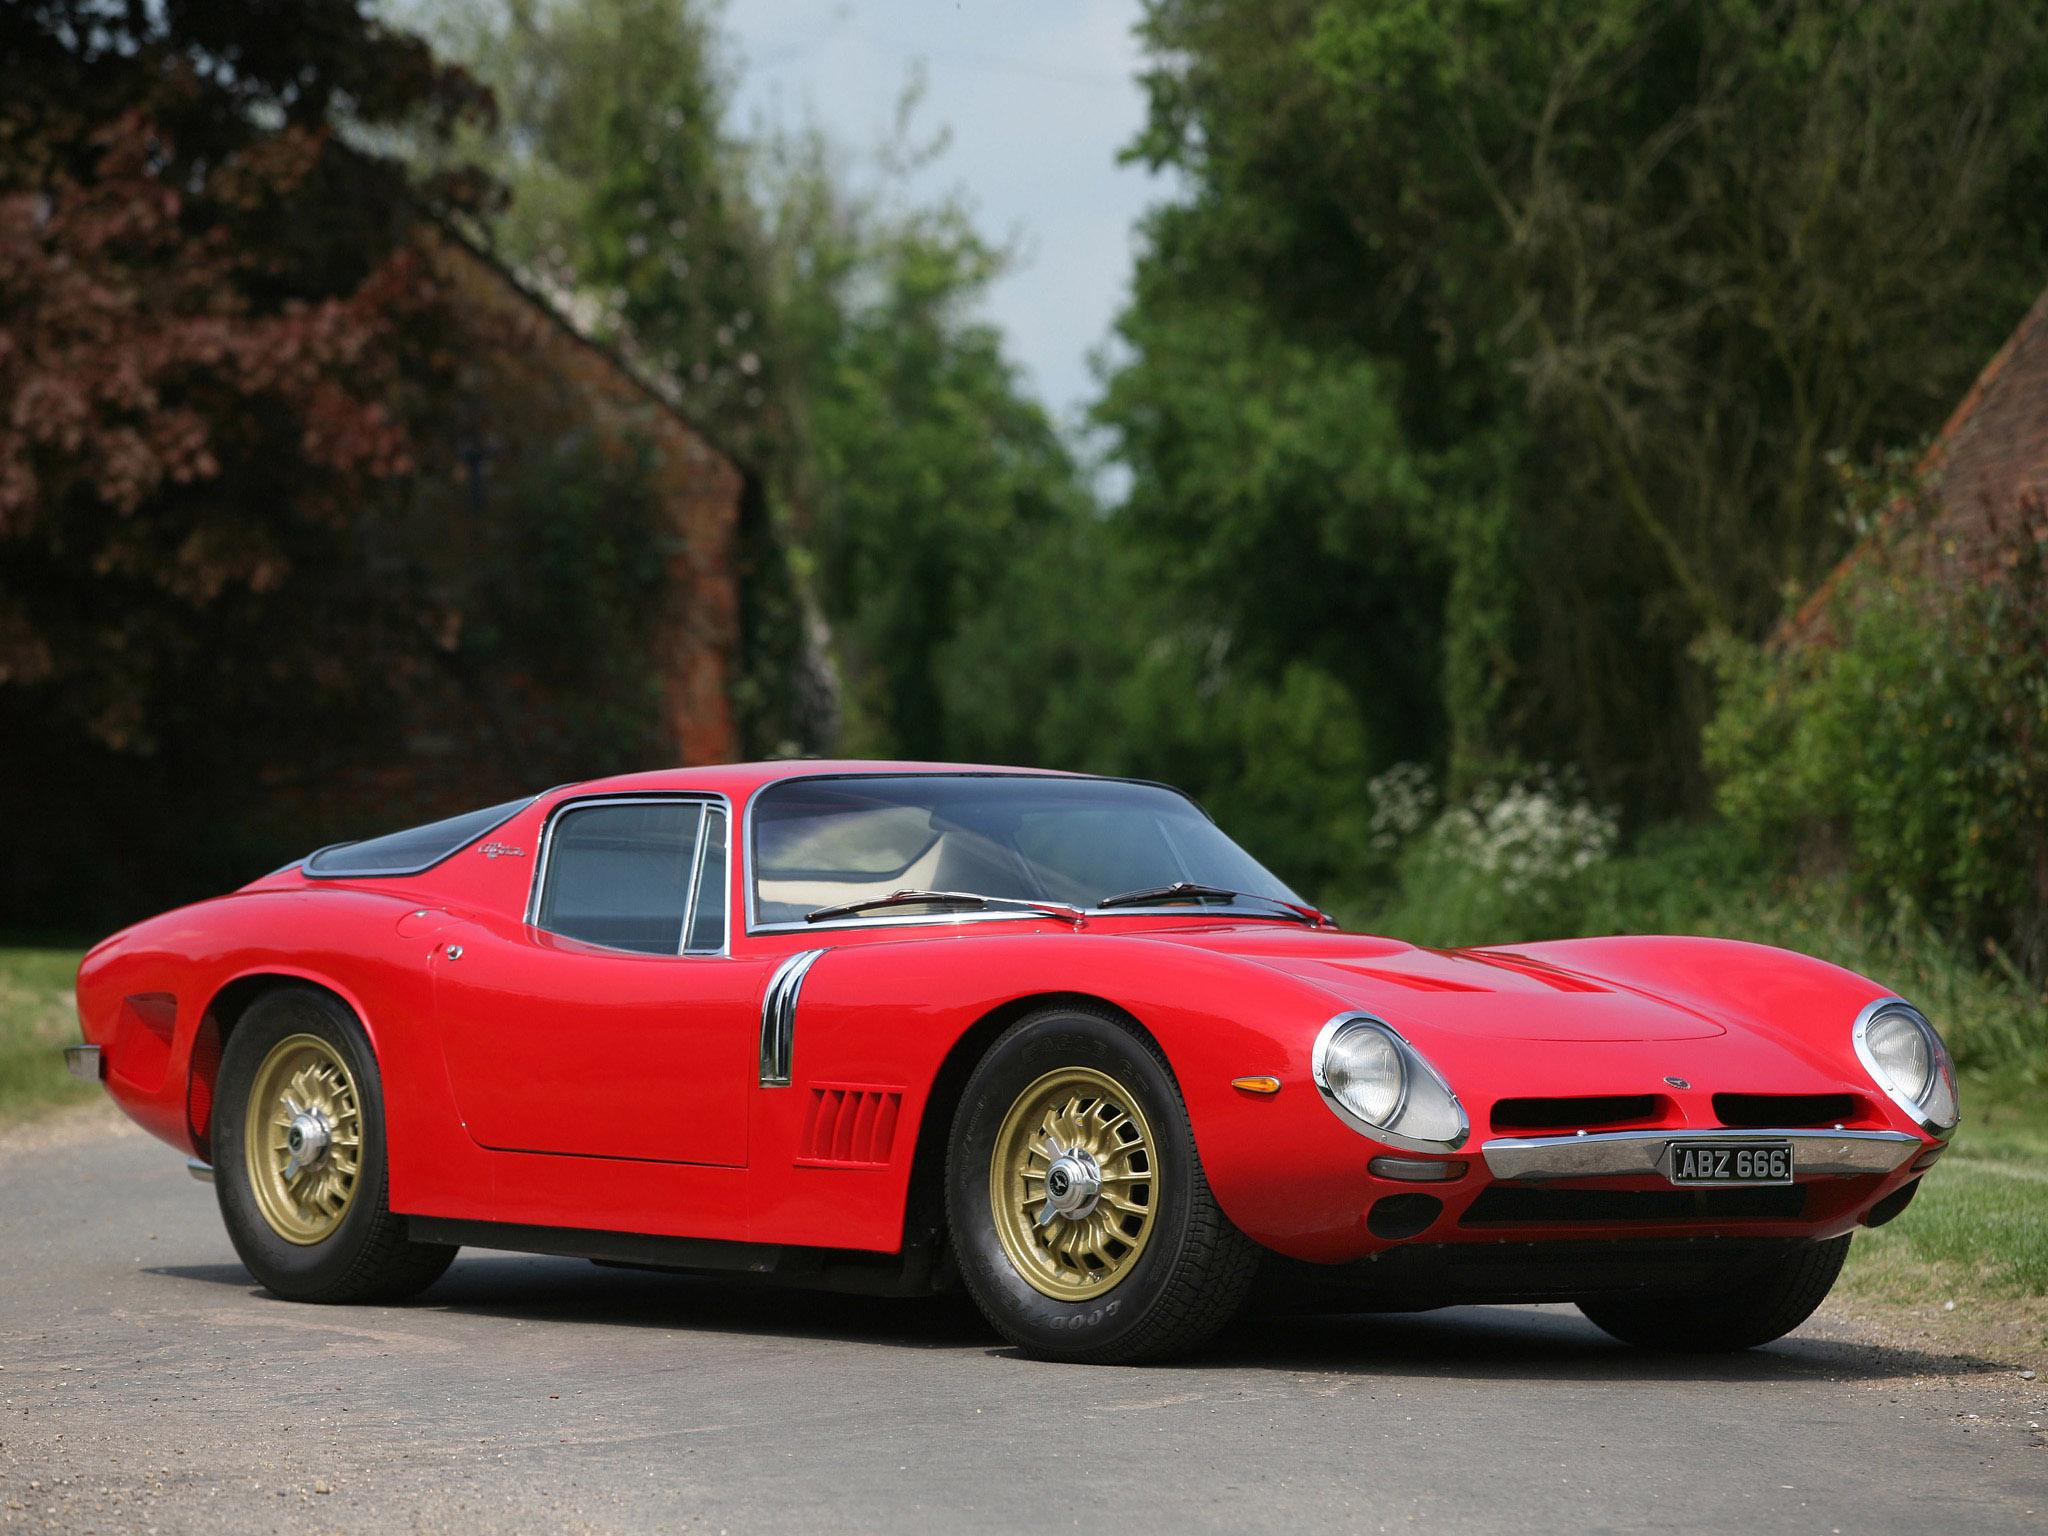 car-vehicle-sports-car-performance-car-ferrari-250-gto-1968-netcarshow-netcar-car-images-car-photo